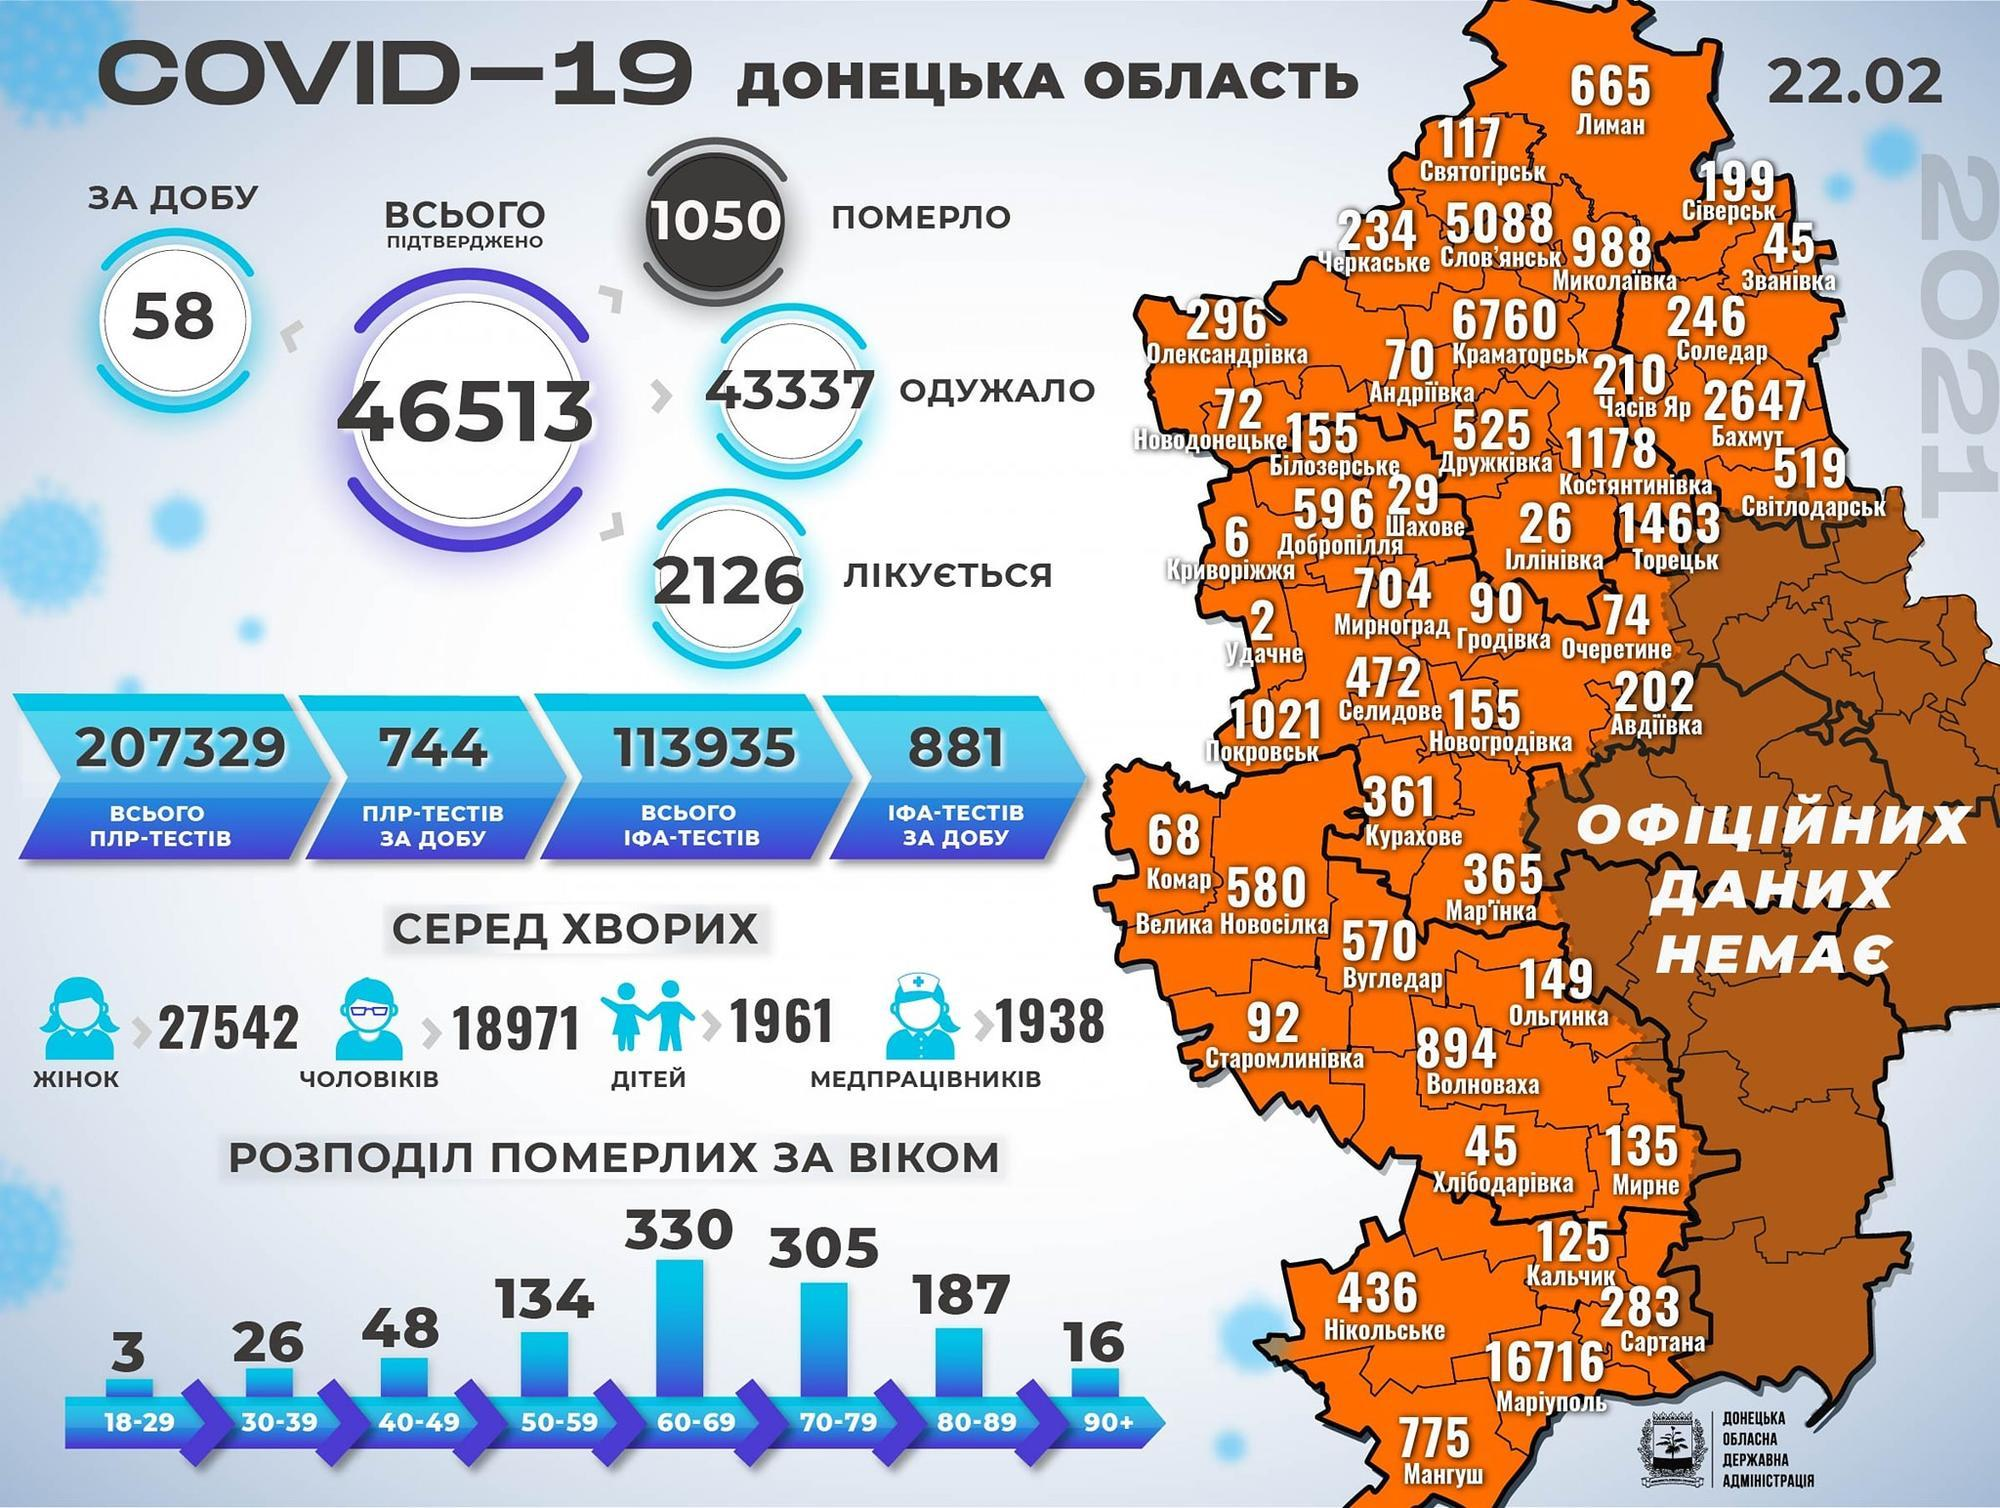 Статистика коронавируса на Донетчине по состоянию на 23 февраля